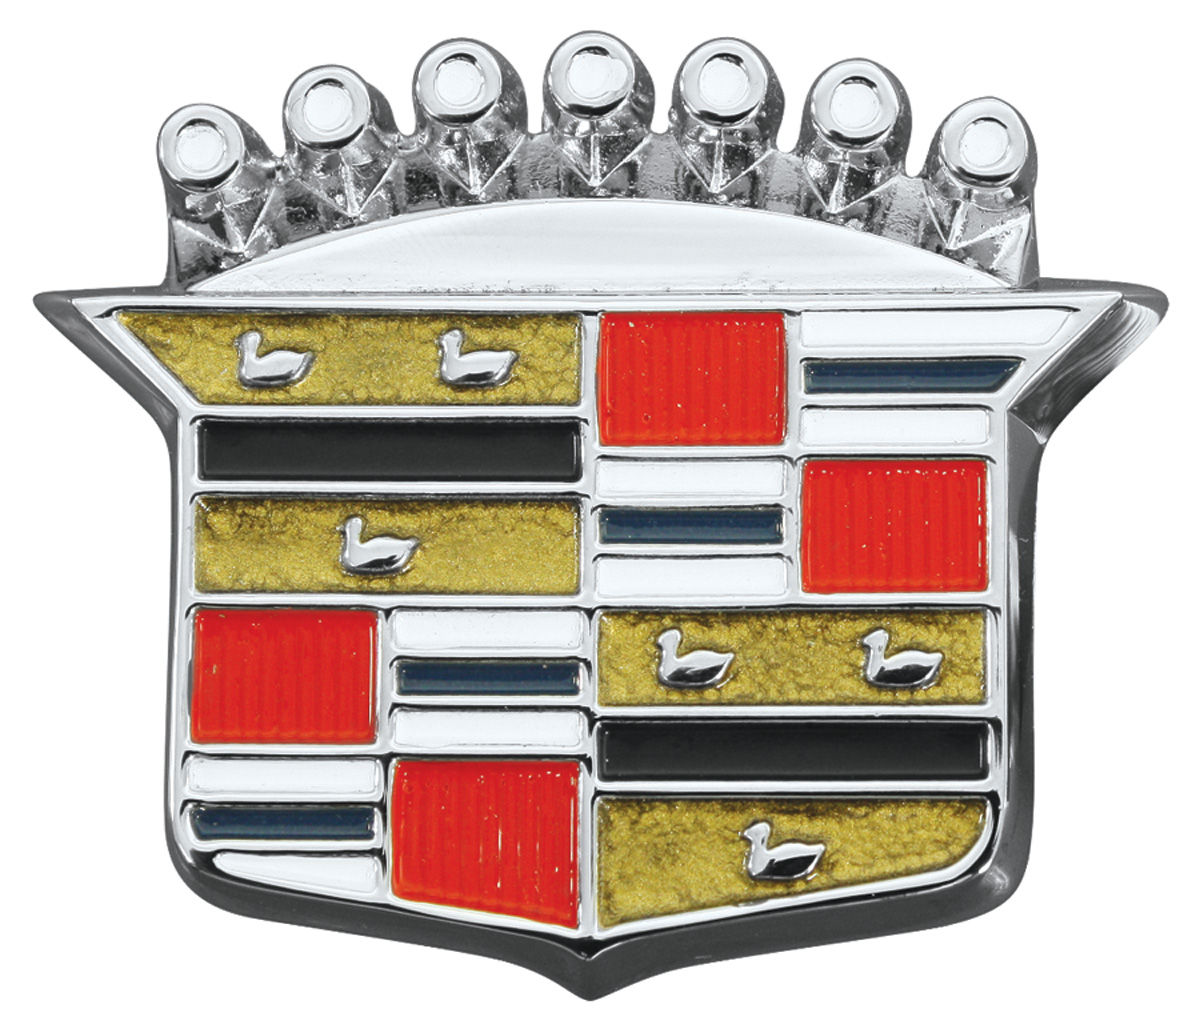 cadillac logo 2015. cadillac trunk lock emblem 196468 crest click to enlarge u0027 logo 2015